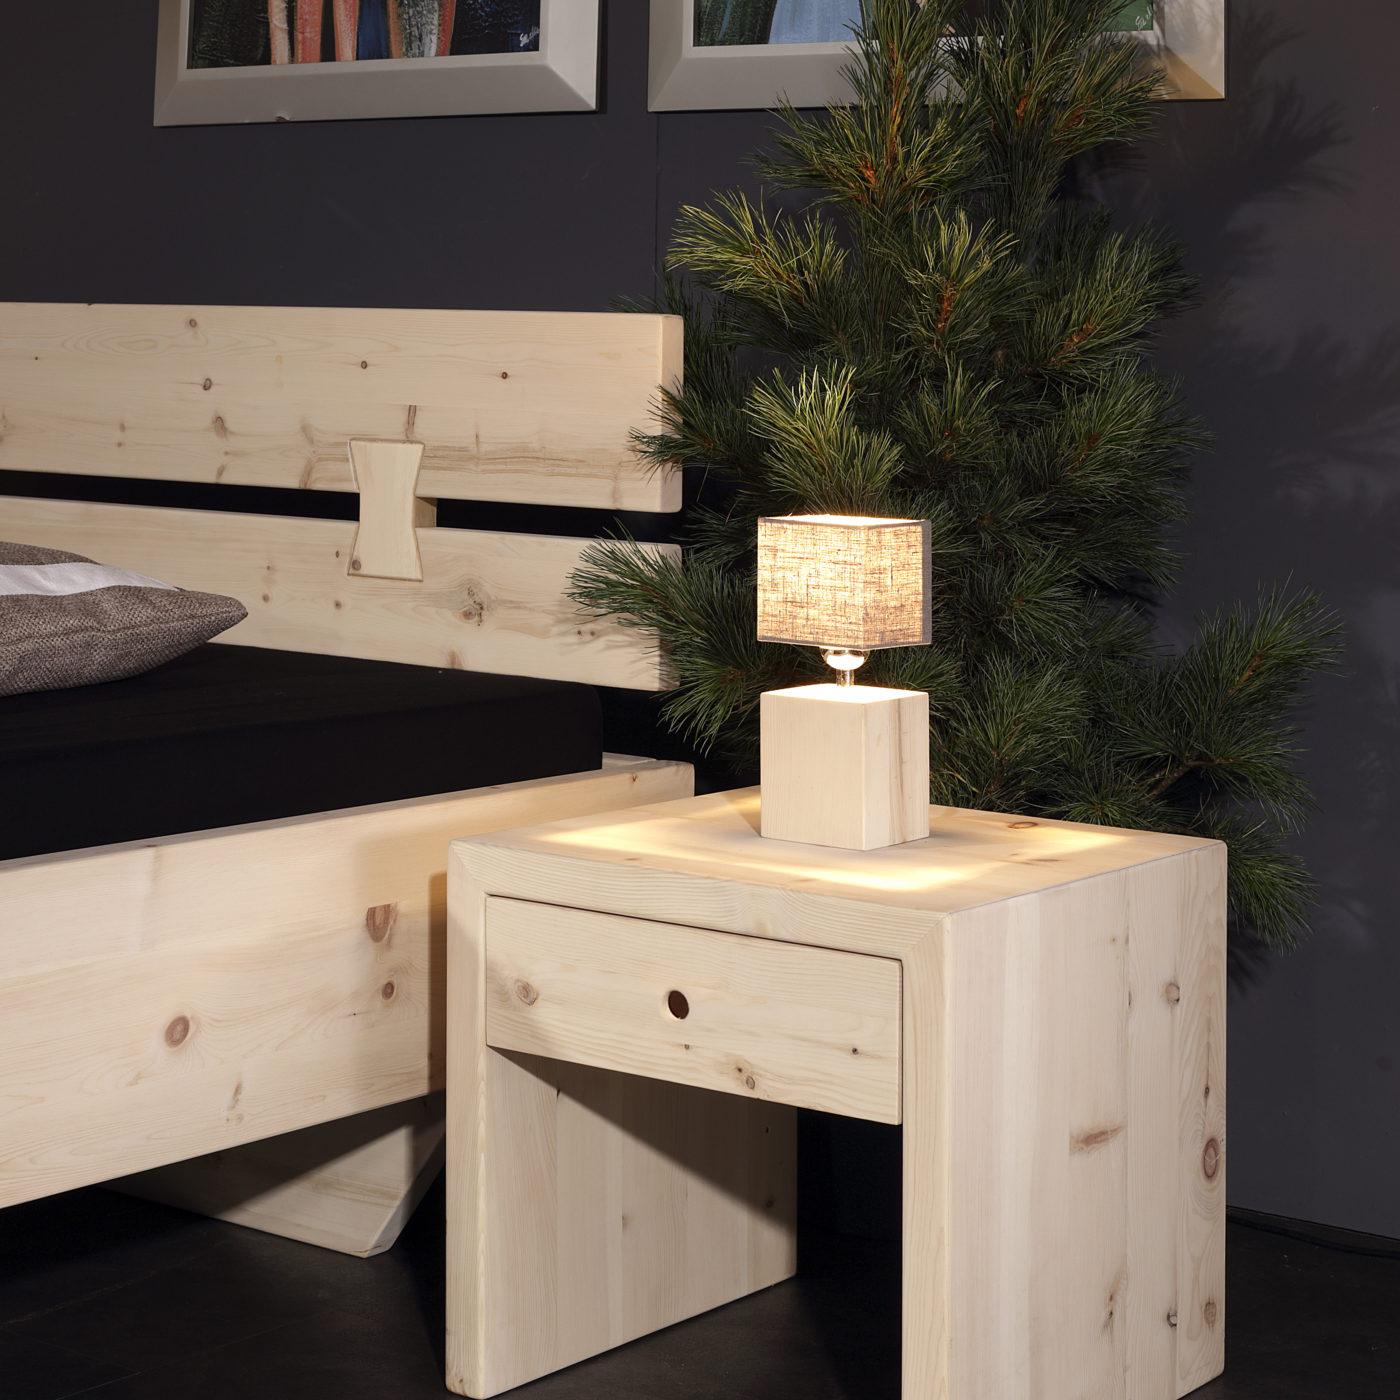 bett rosenheim arve zirbe sprenger m bel. Black Bedroom Furniture Sets. Home Design Ideas